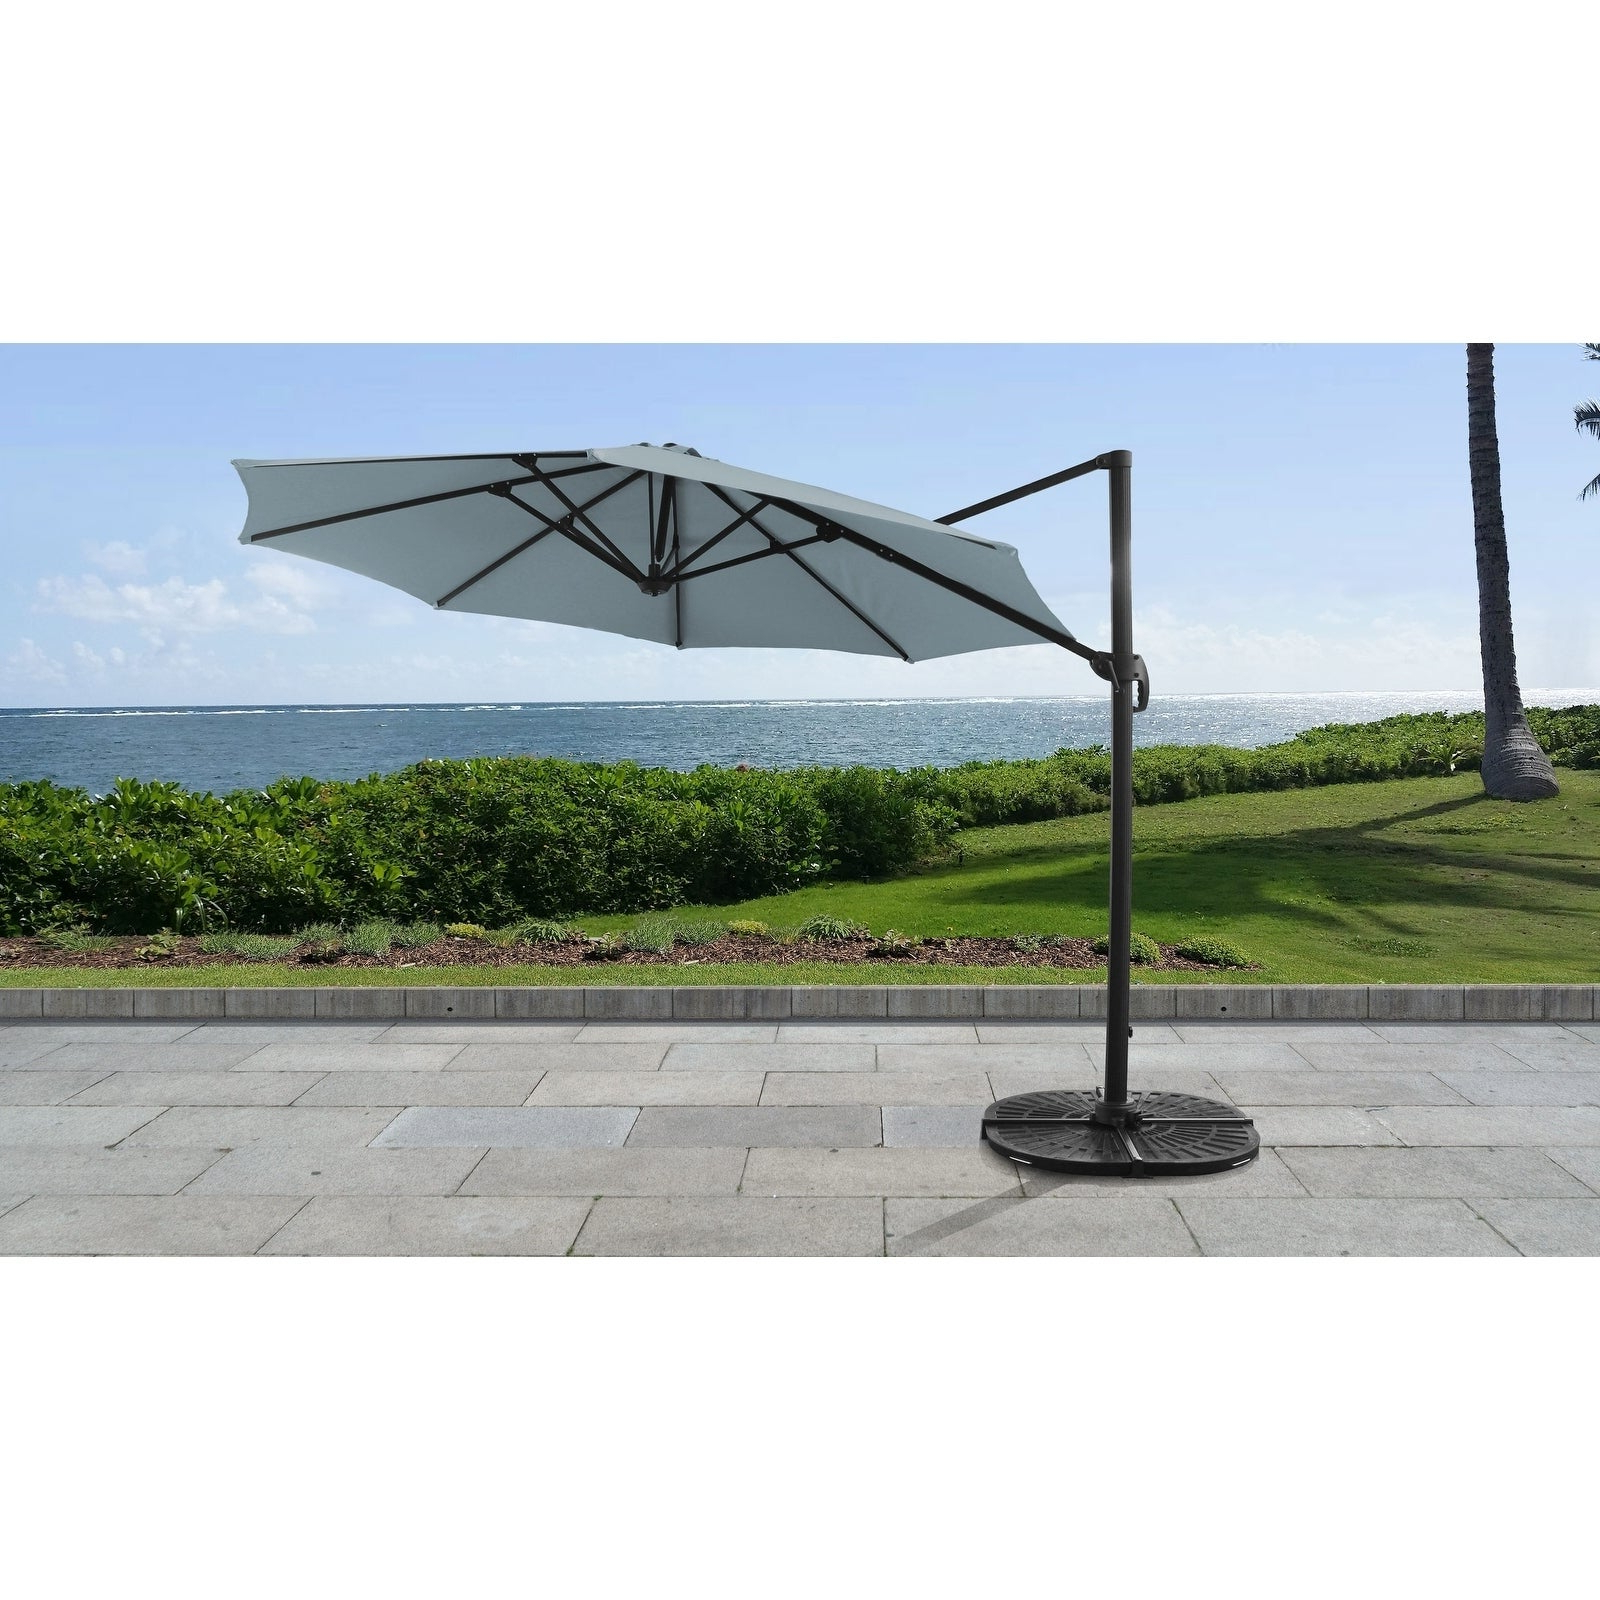 Cantilever Umbrellas In Popular 11' Outdoor Cantilever Umbrella (View 11 of 20)